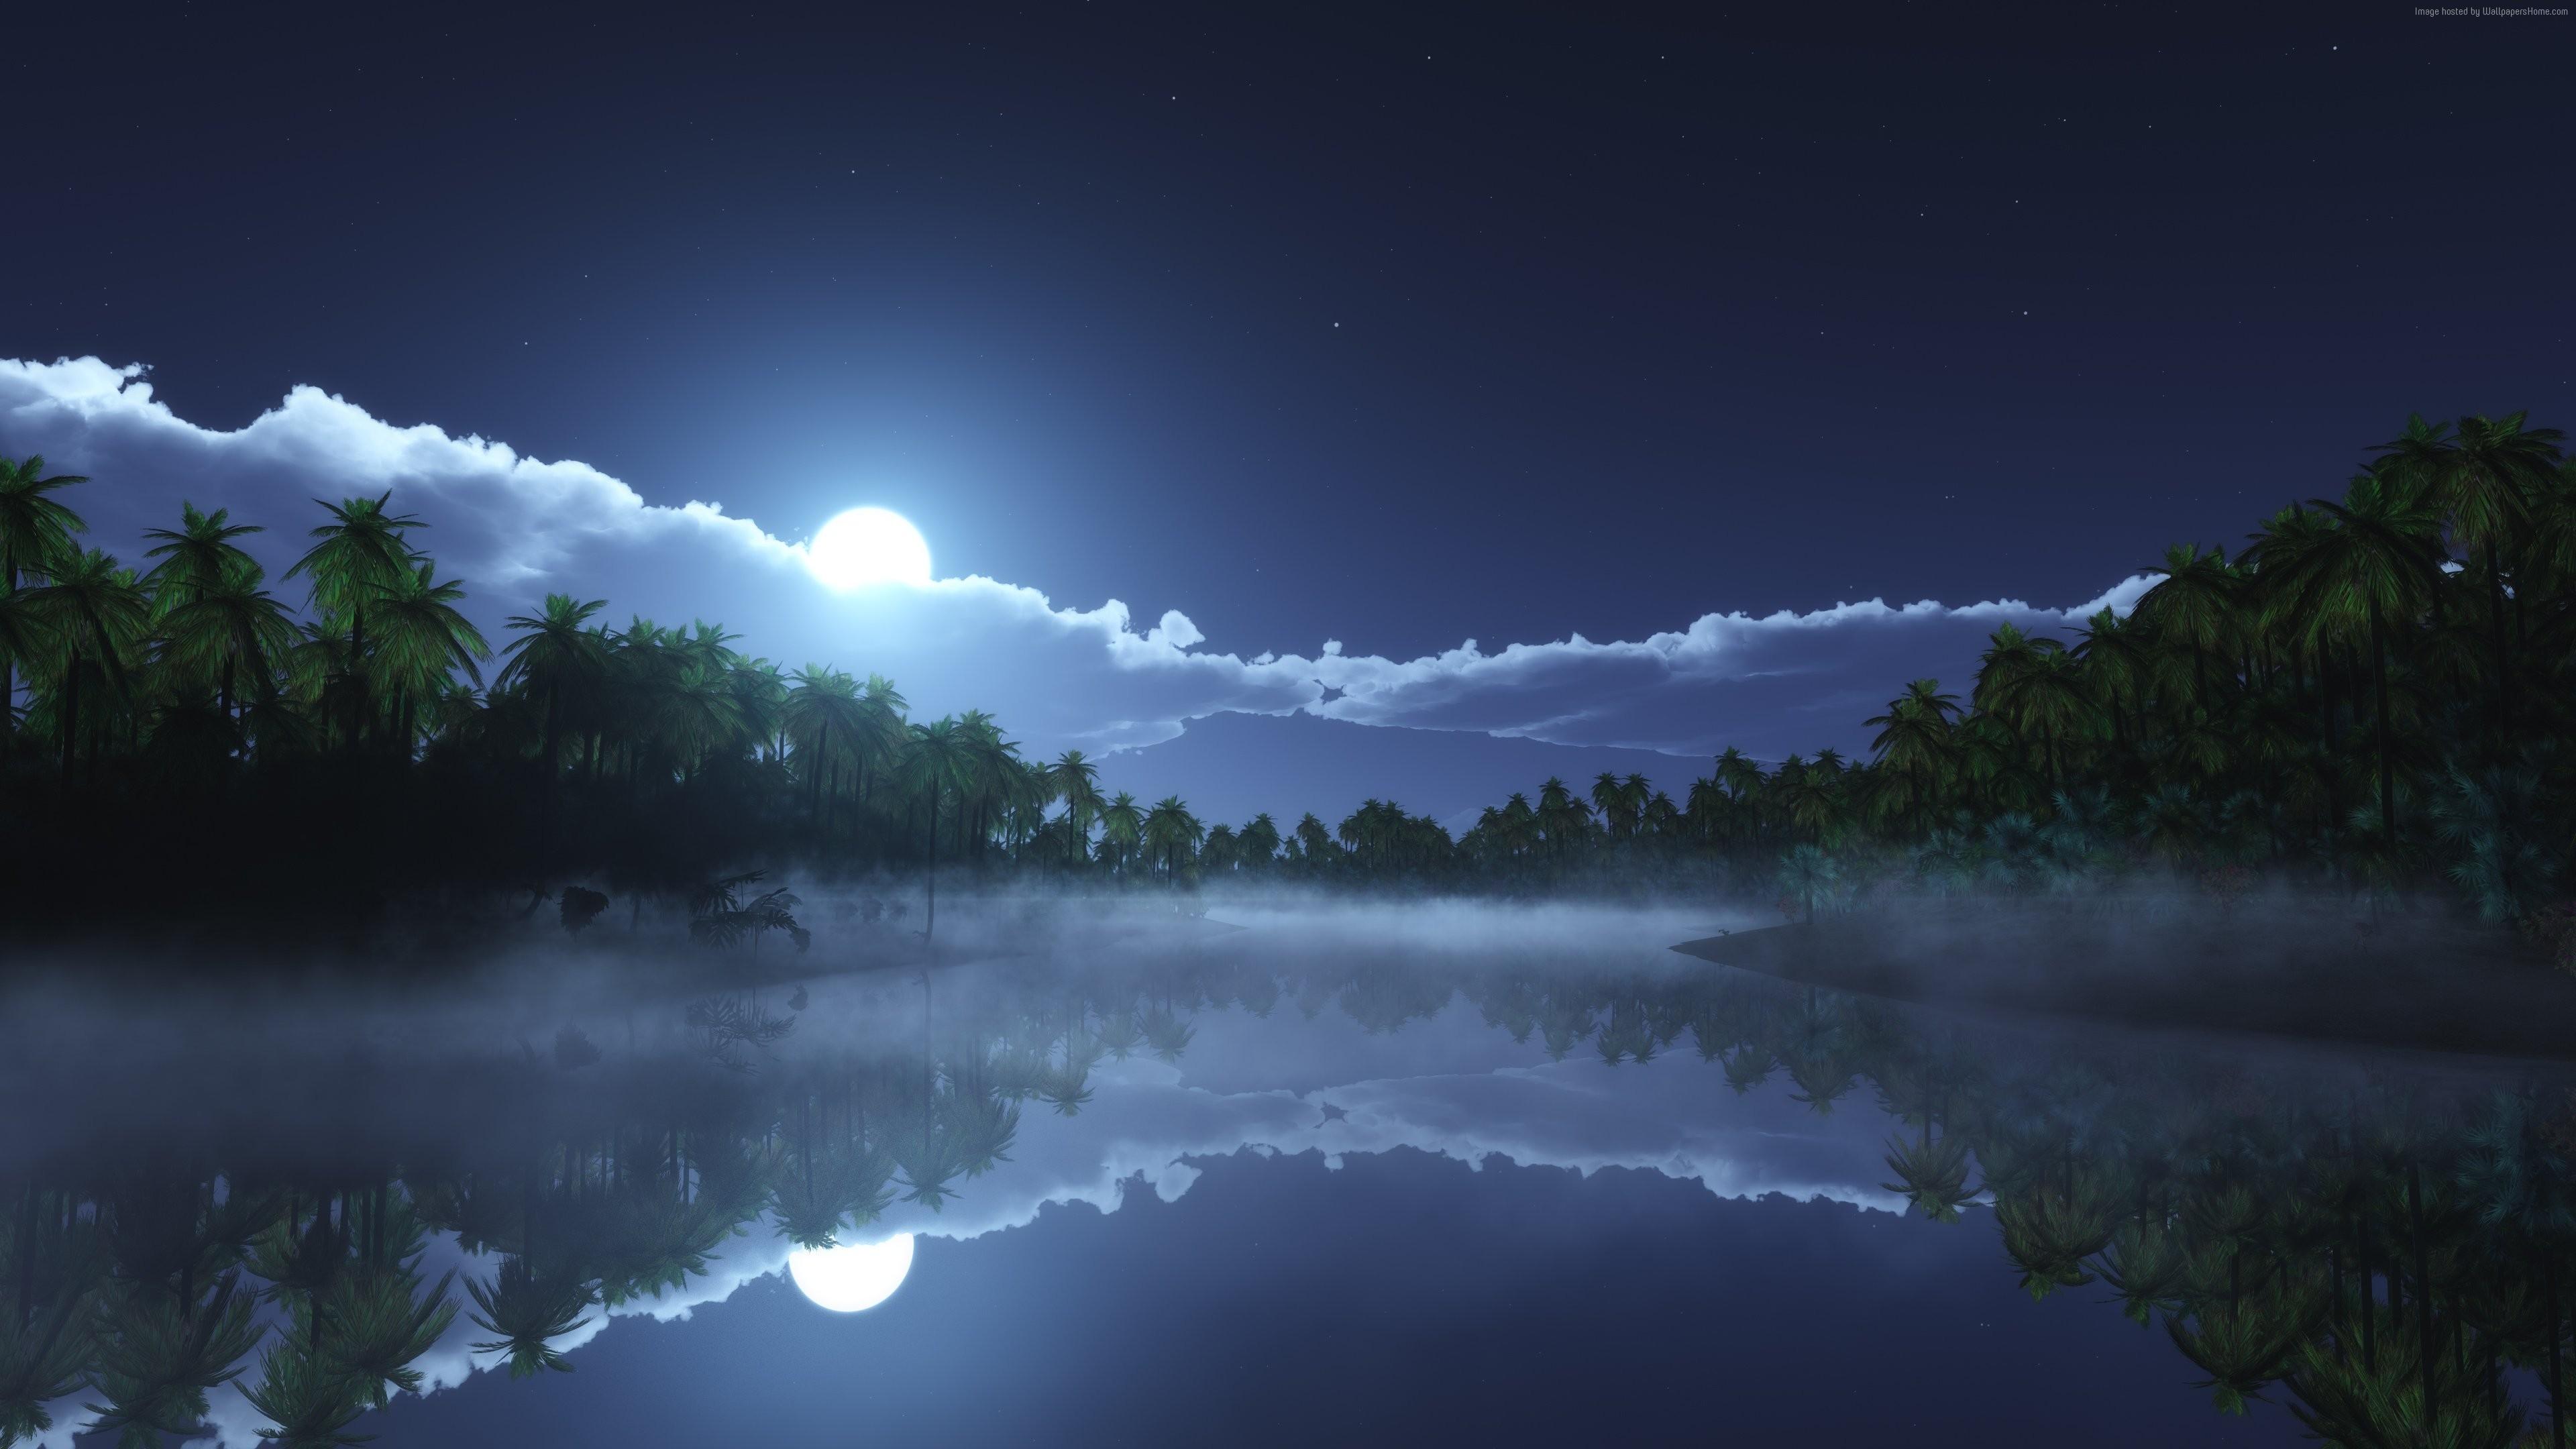 River Wallpaper Nature Water River sea palms night moon 3840x2160